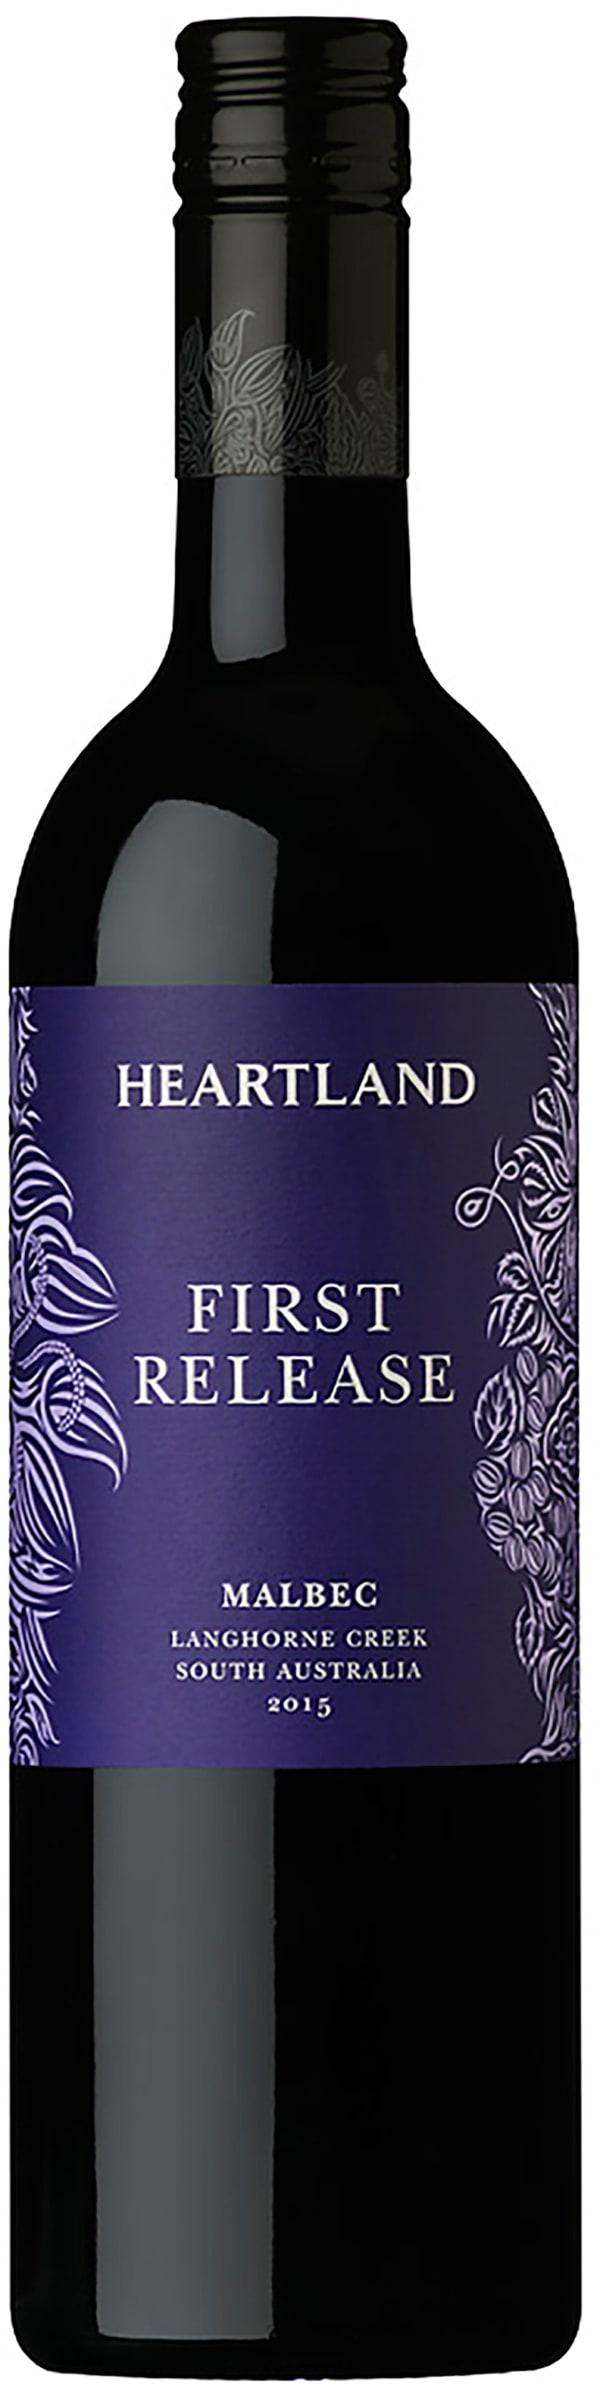 Heartland First Release Malbec 2015